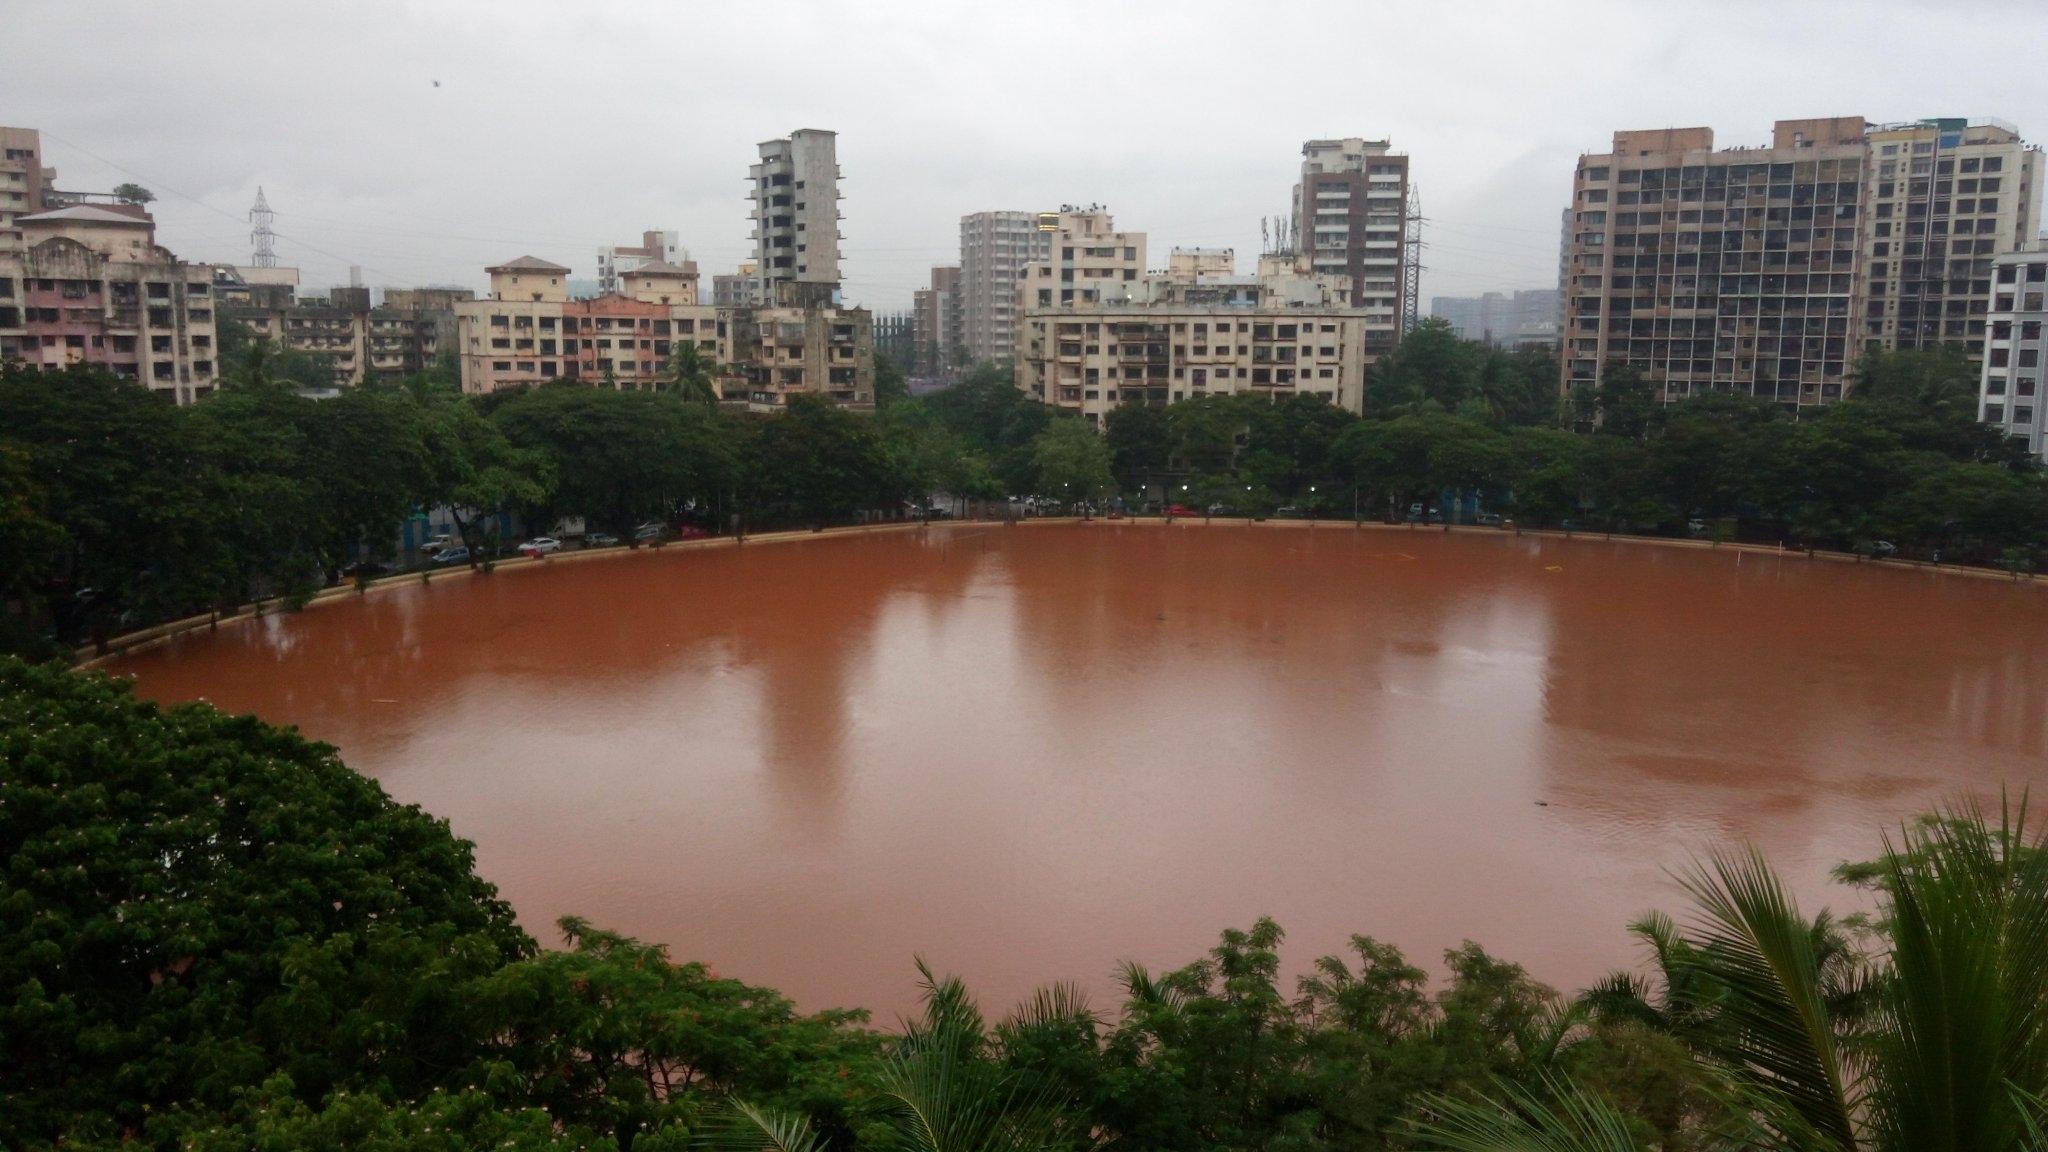 QMumbai: Panic as Gas Leak Reported Across City